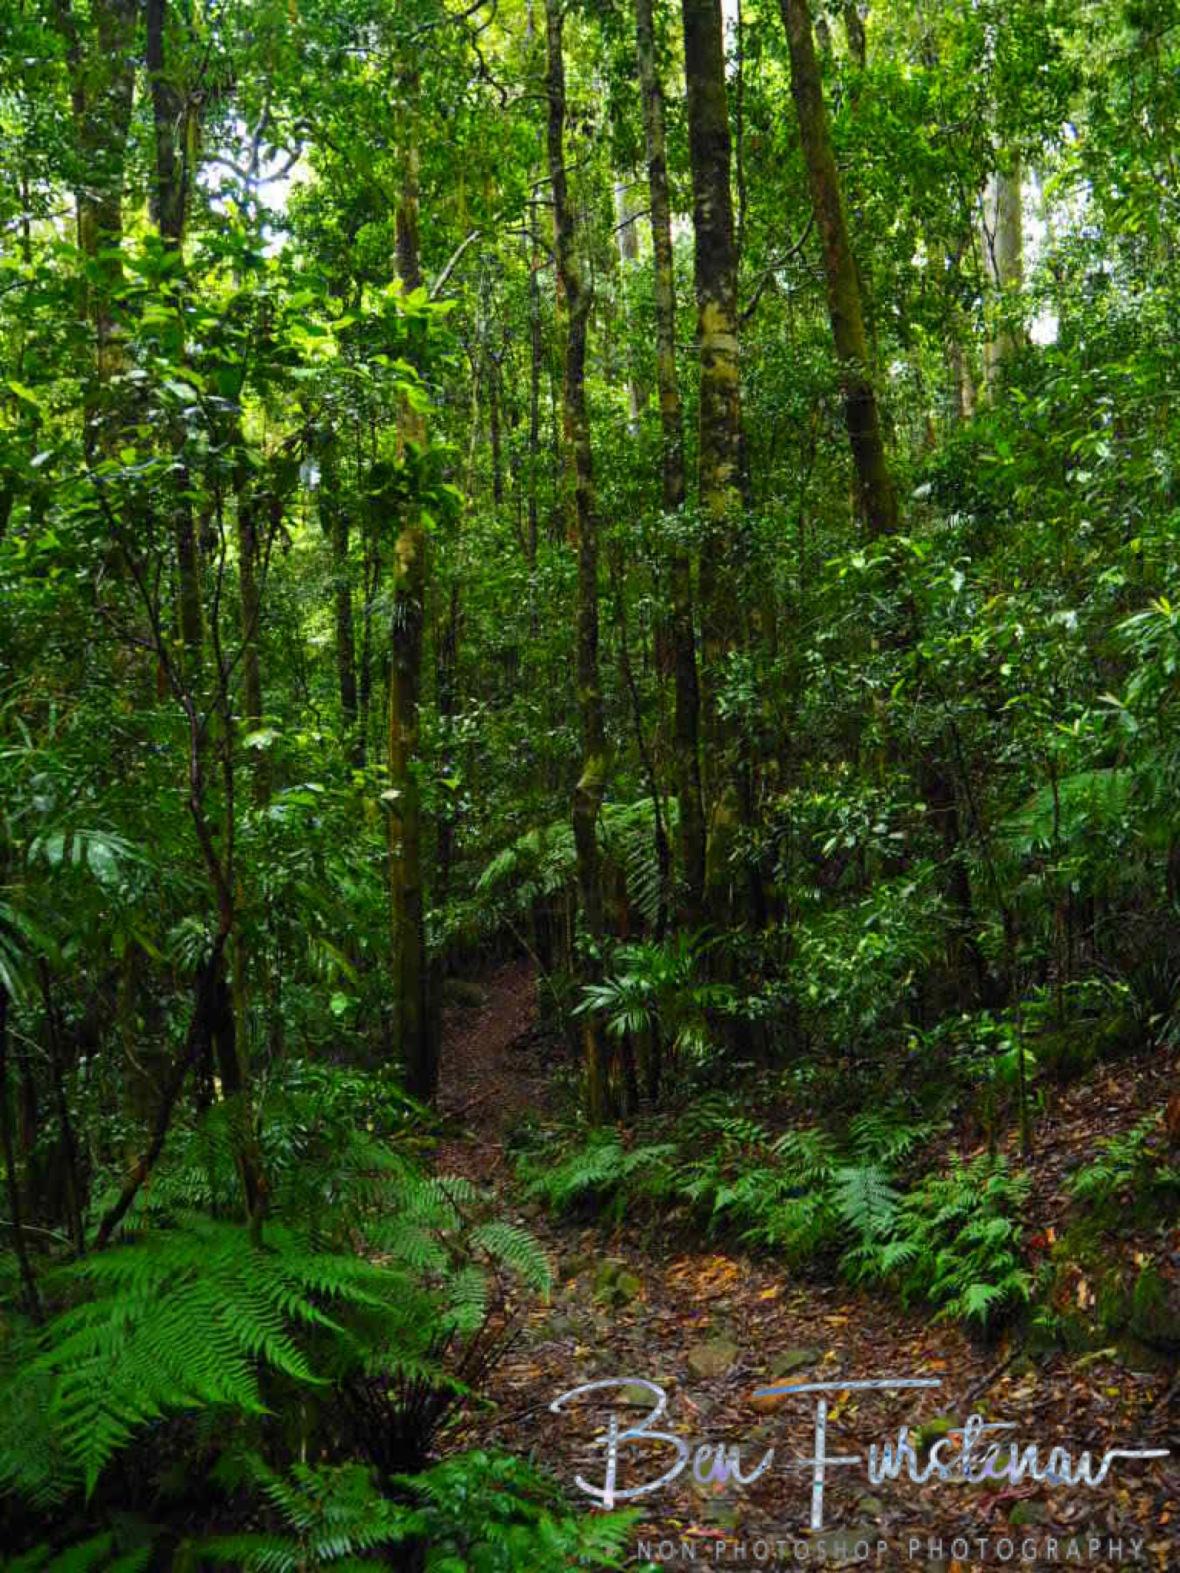 Washpool Creek hiking trail, Washpool National Park, NSW, Australia